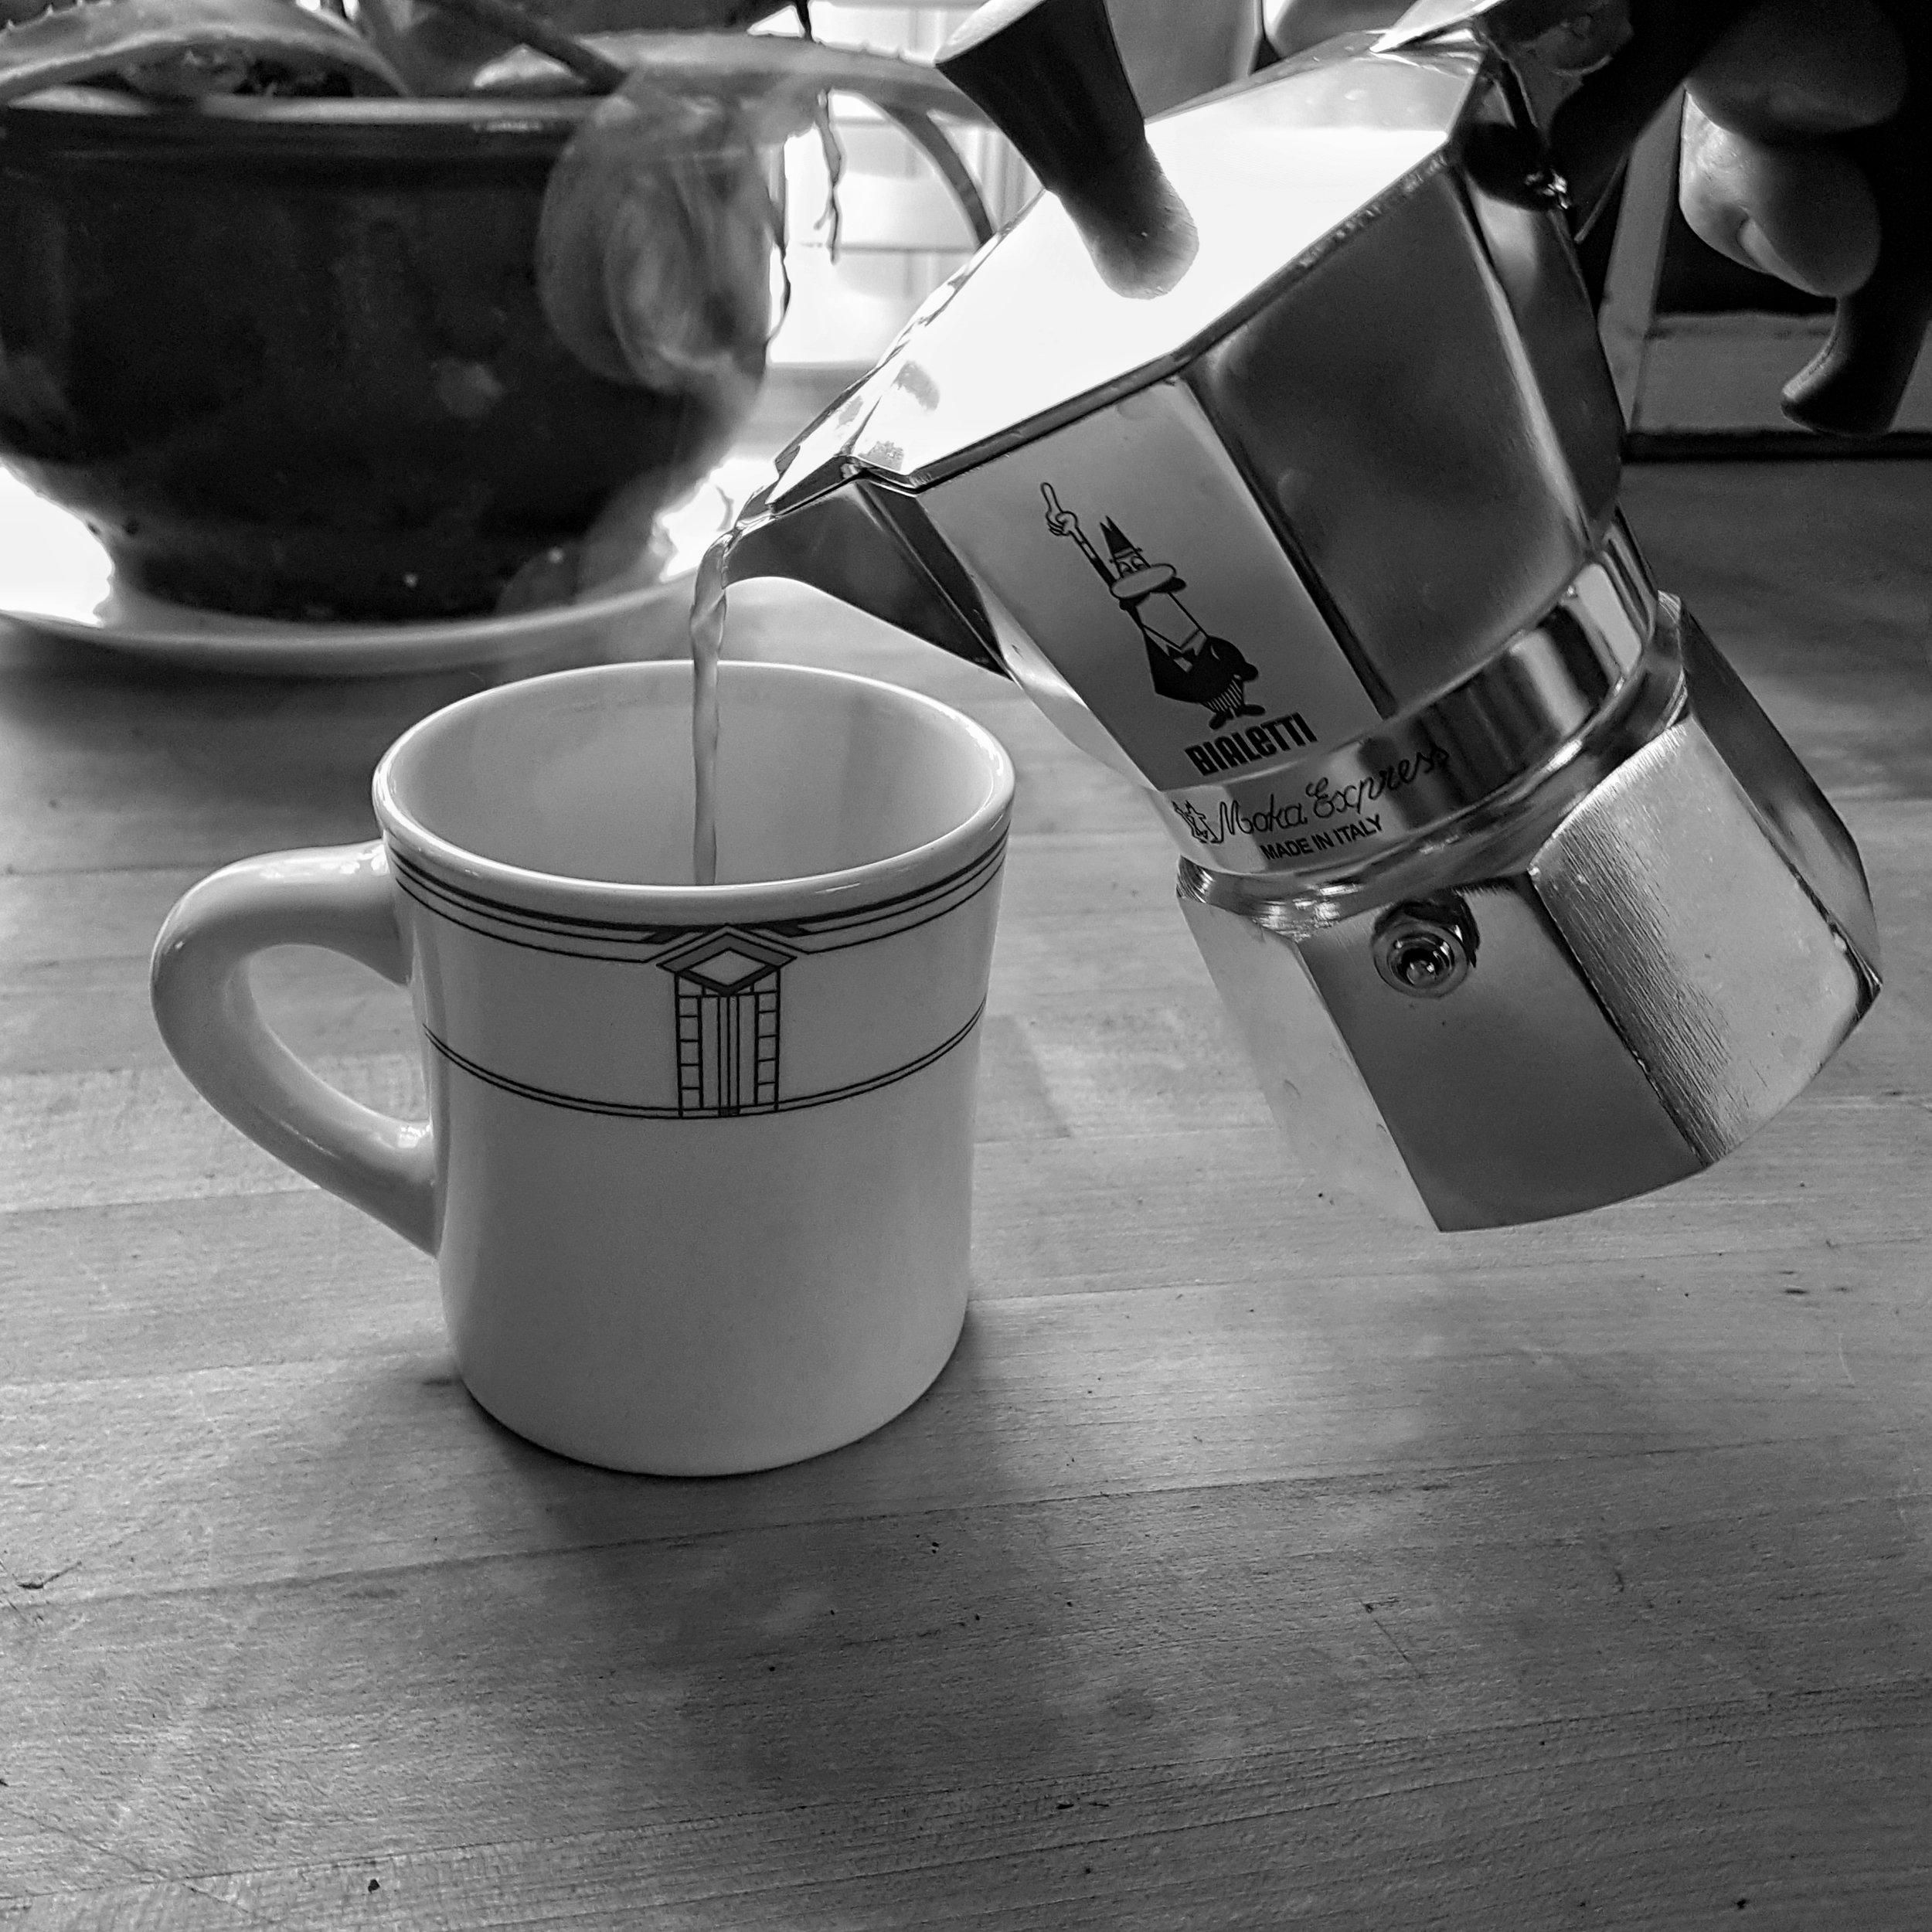 A Moka Pot pouring coffee into a cup on a table